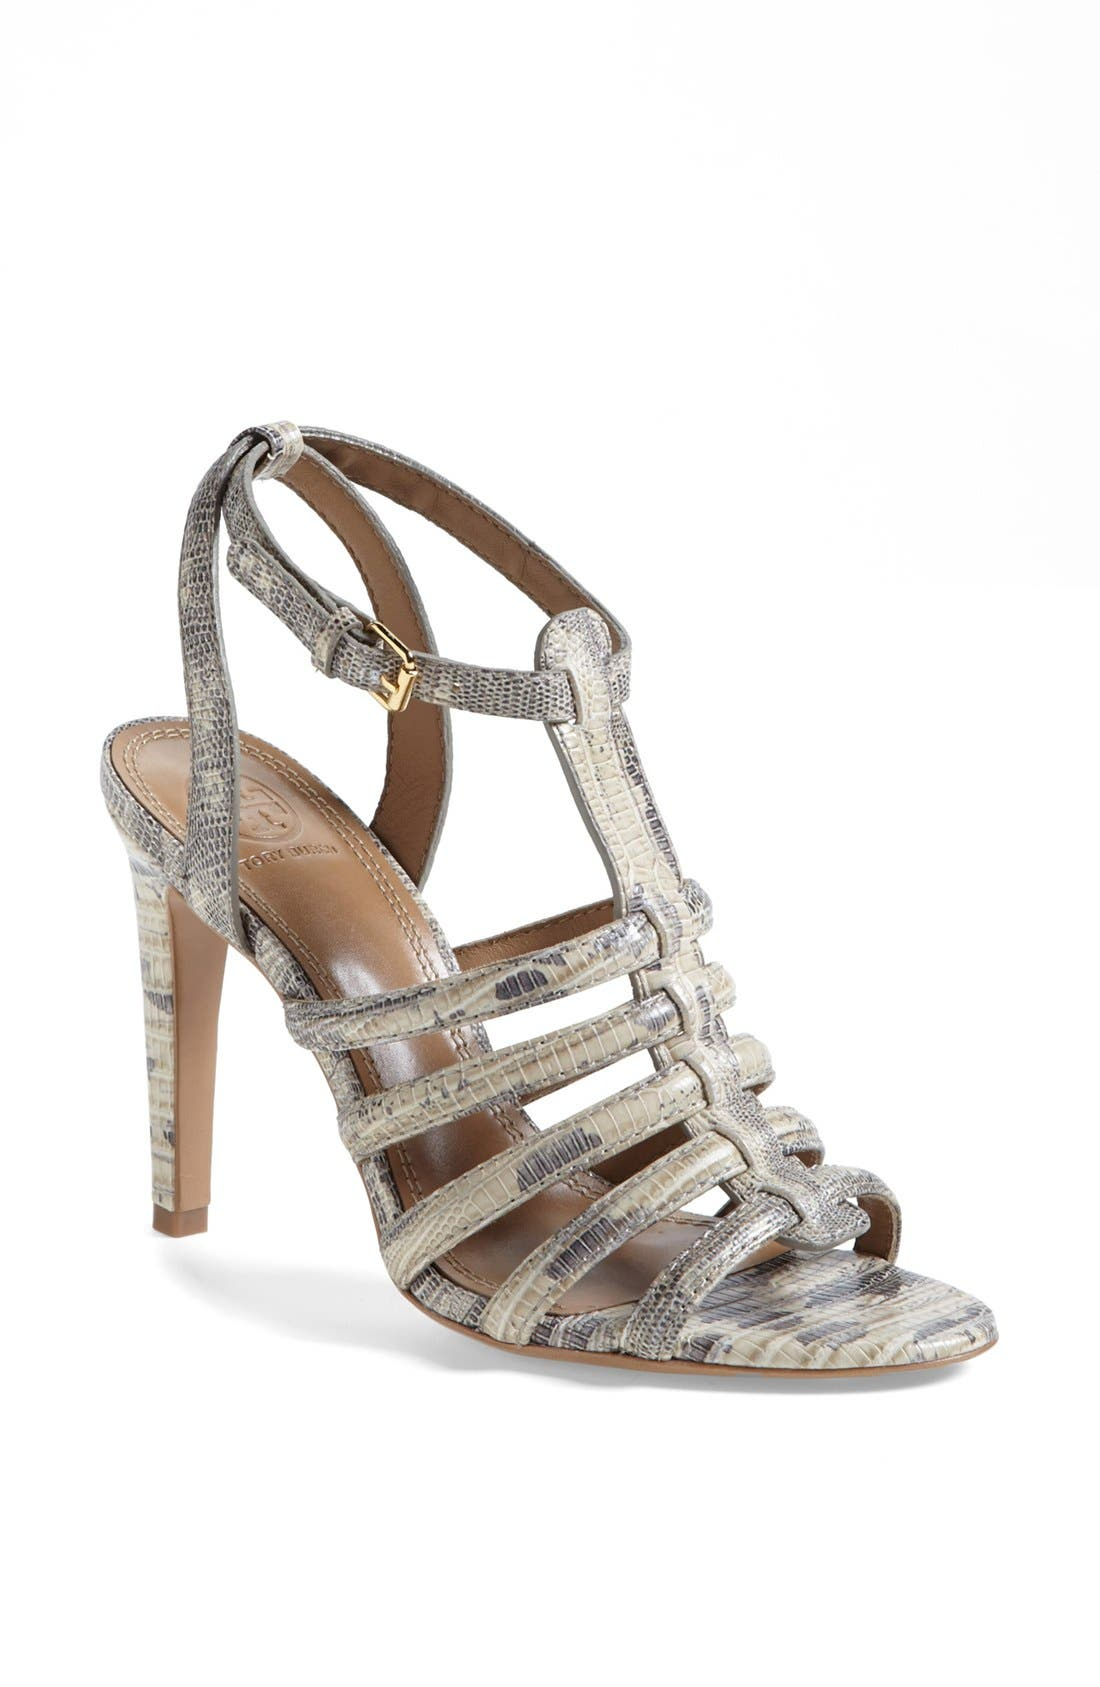 Main Image - Tory Burch 'Charlene' Sandal